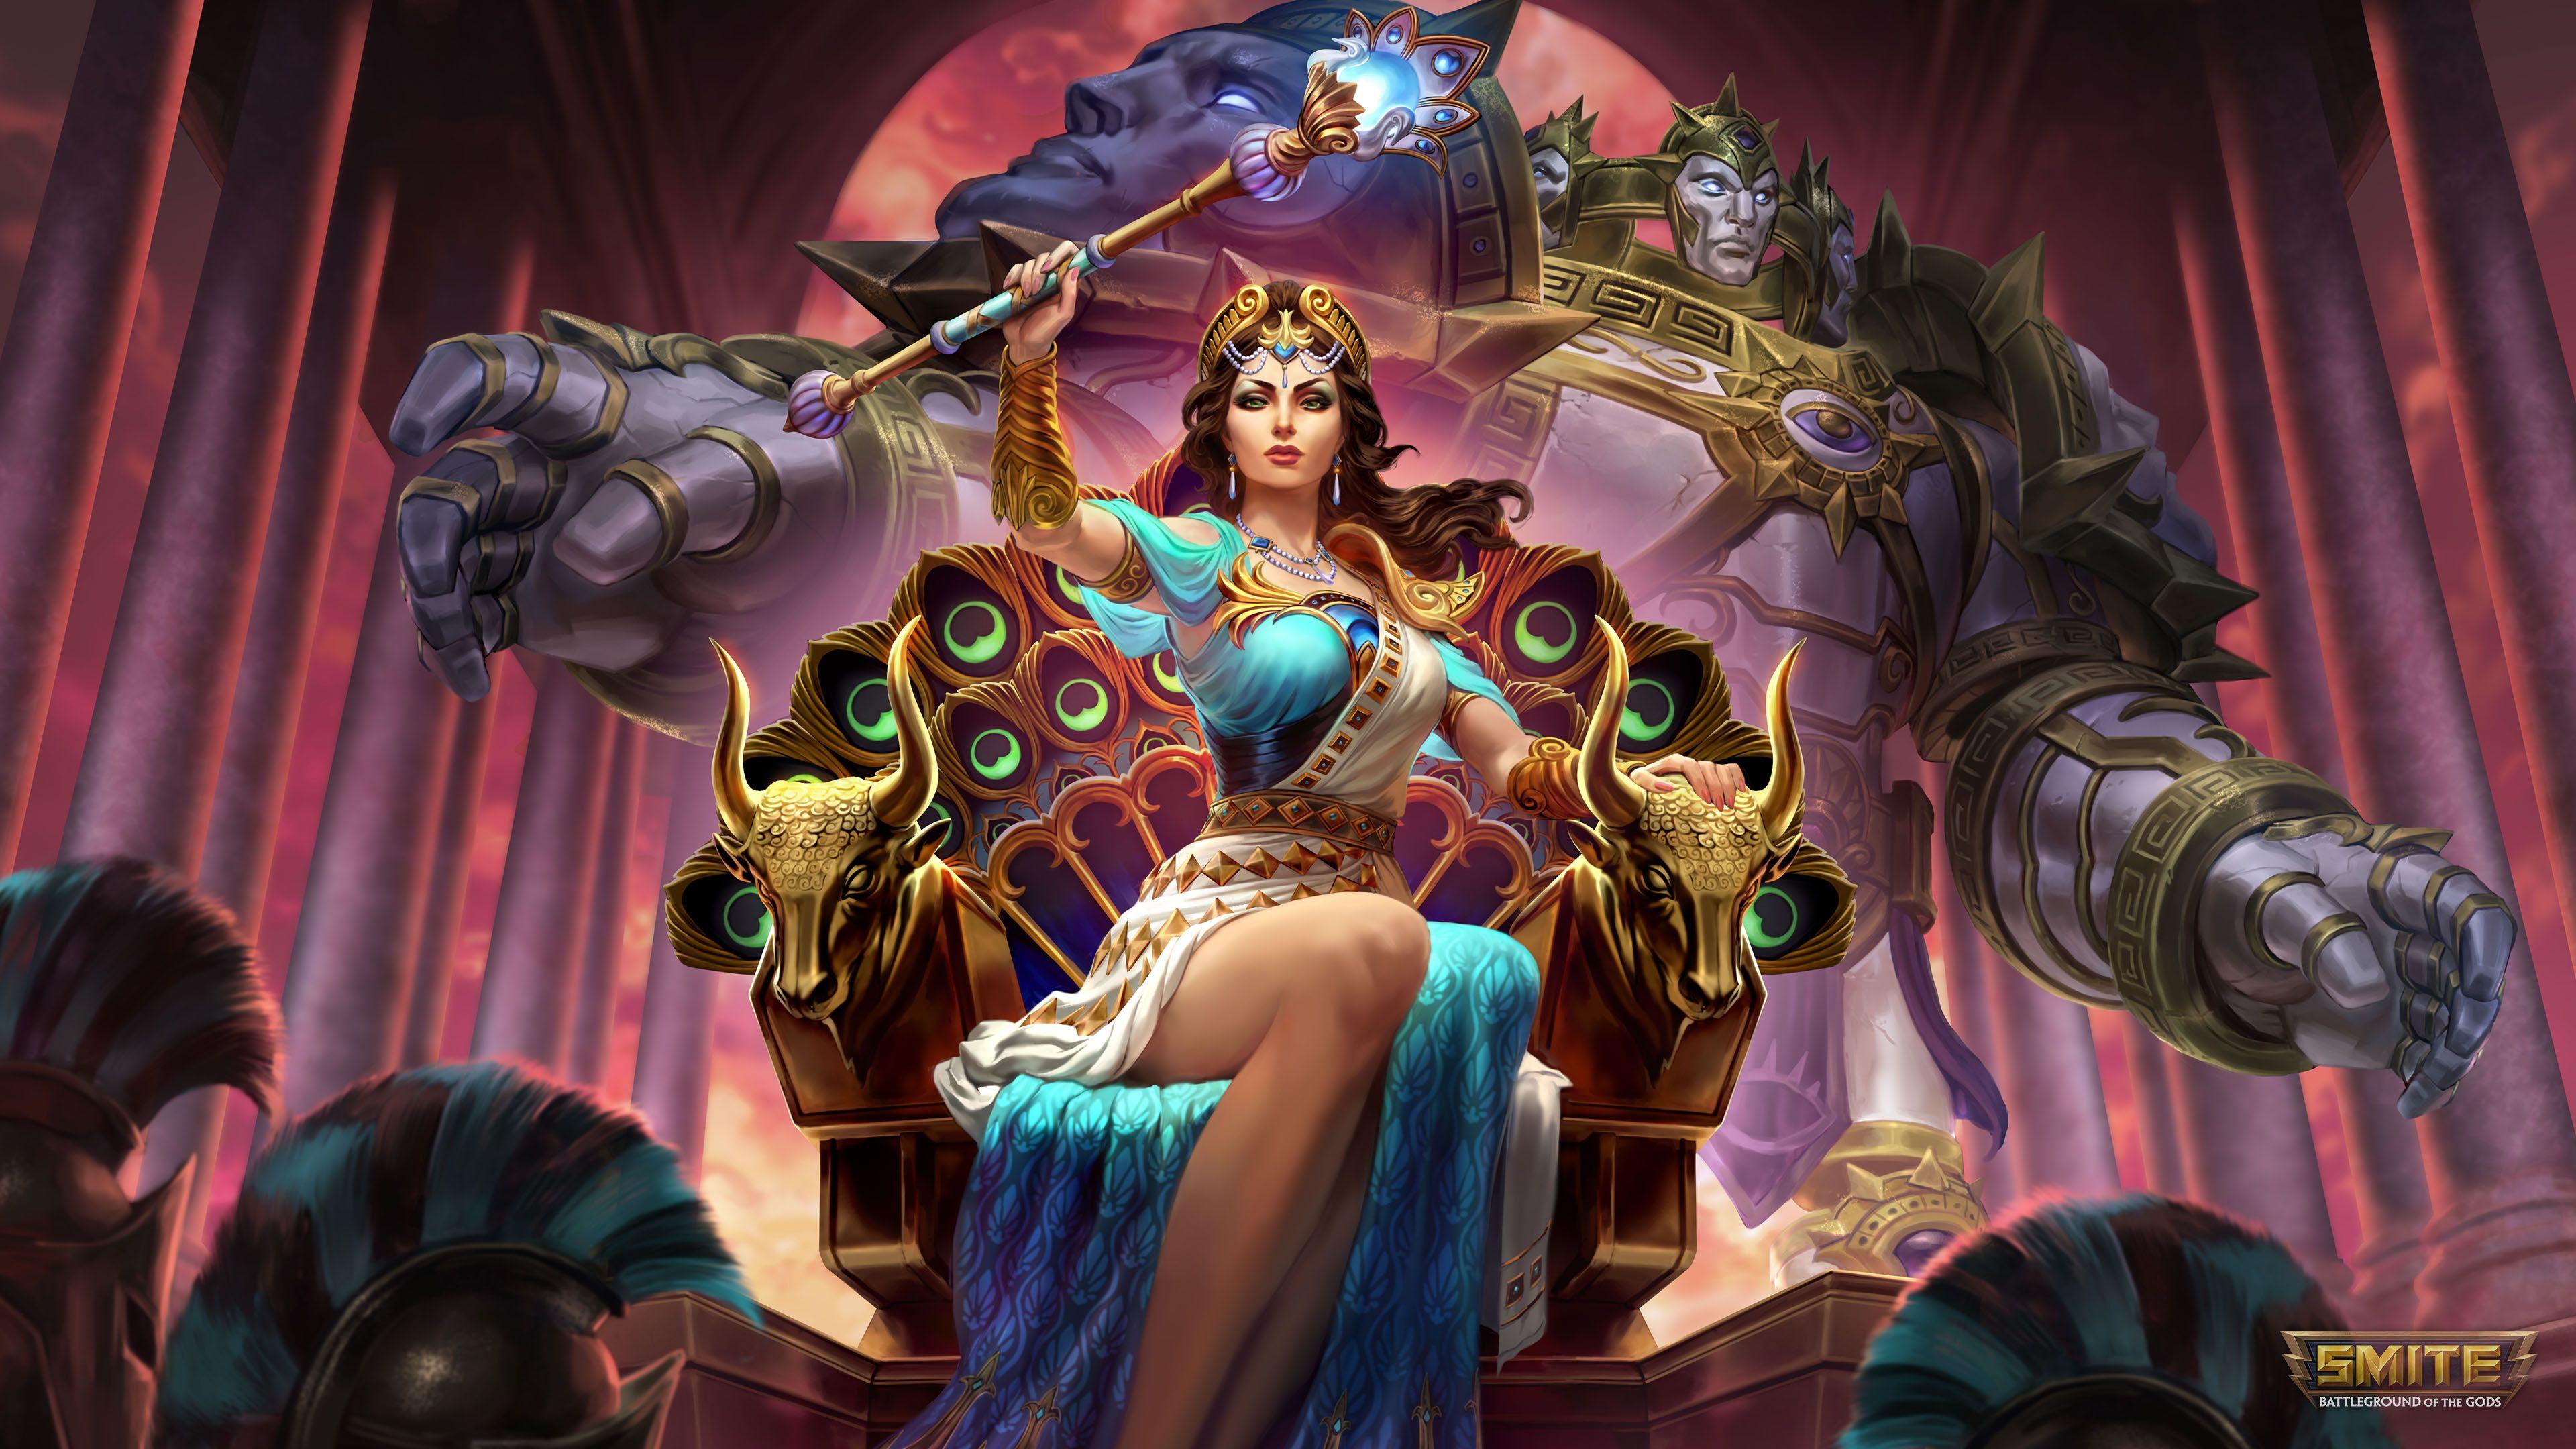 90's Porn Film Medusa Goddess hera queen of the gods 4k wallpaper | dieux